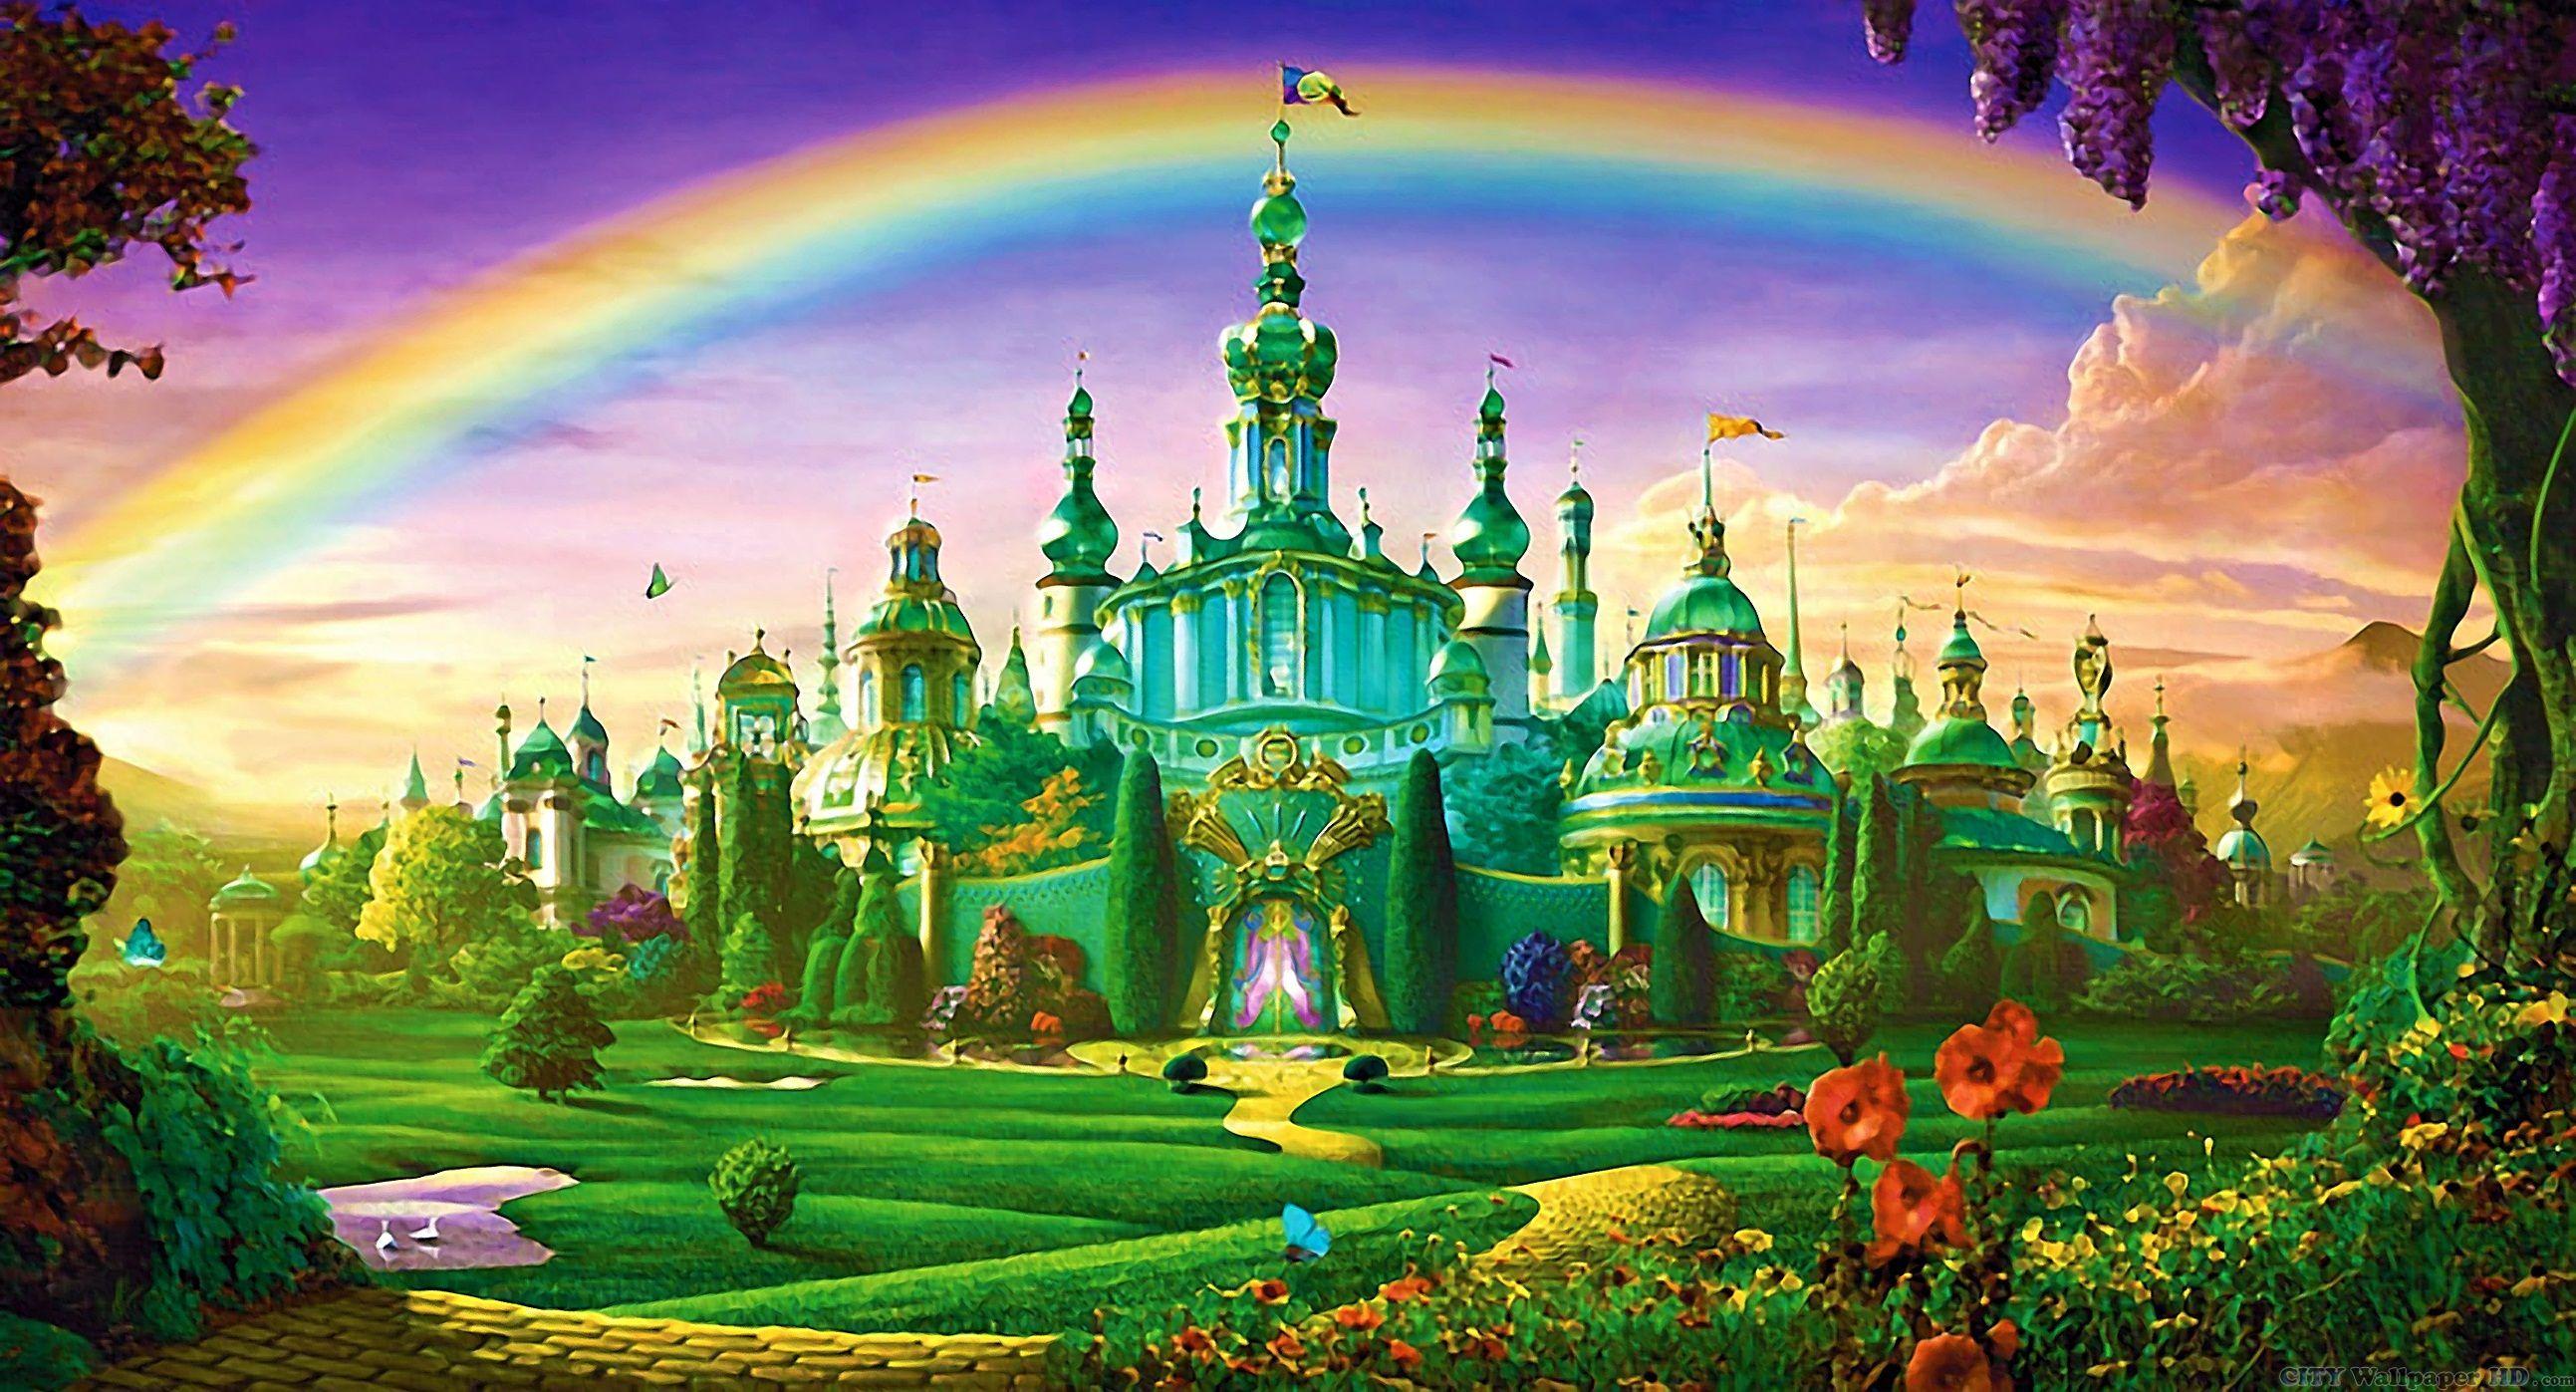 Pin By Daniel Wilson On Wizard Of Oz Wizard Of Oz Emerald